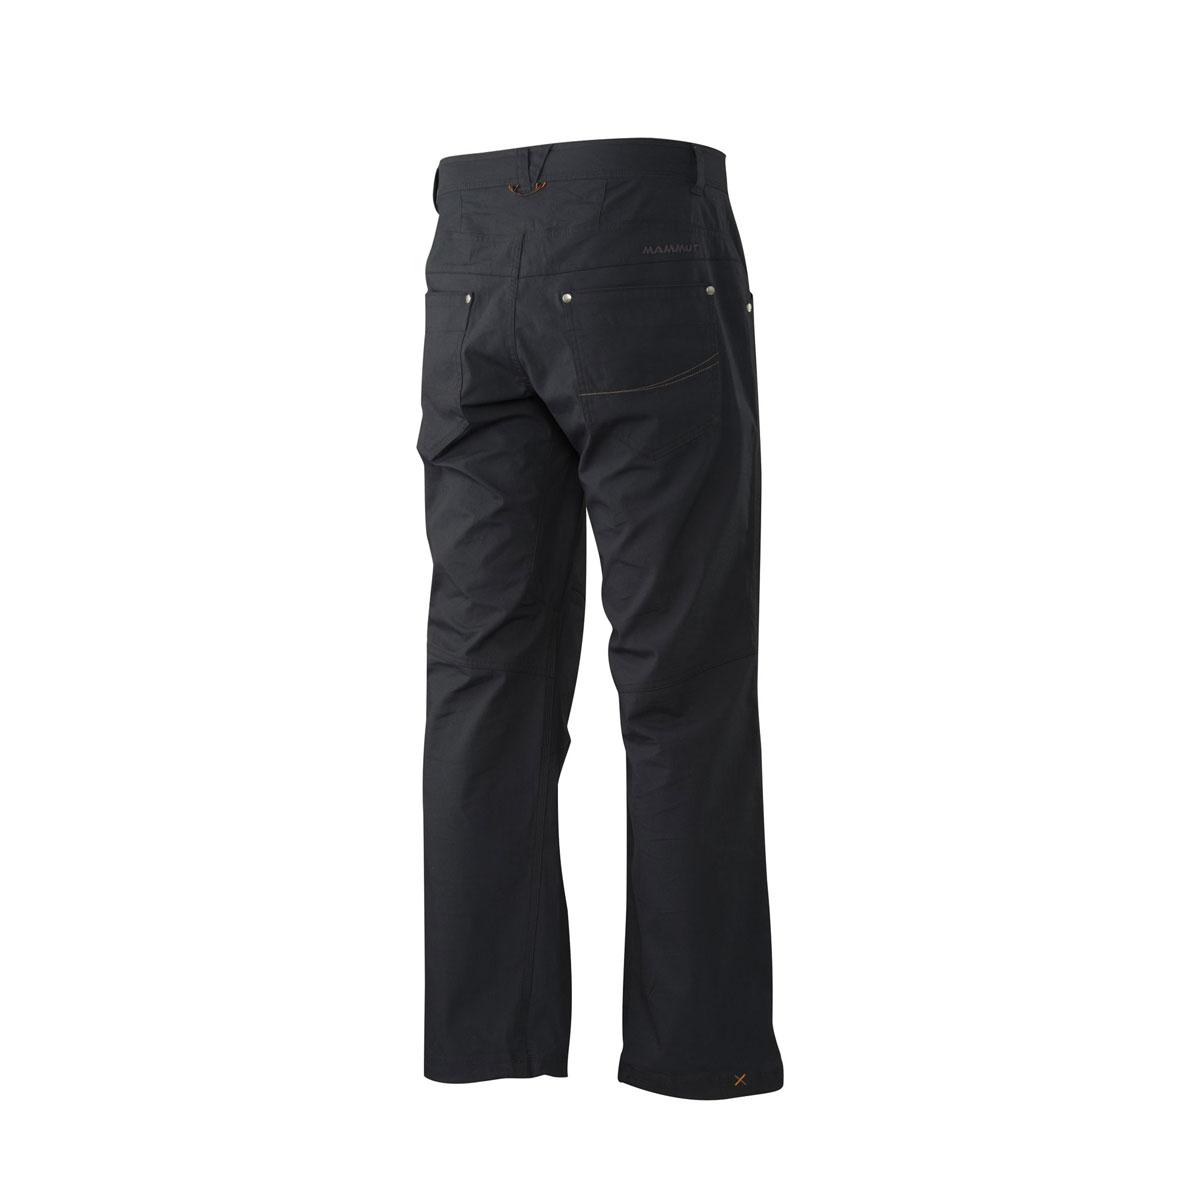 Mammut El Cap Pants Men S Pants Trail Pants And